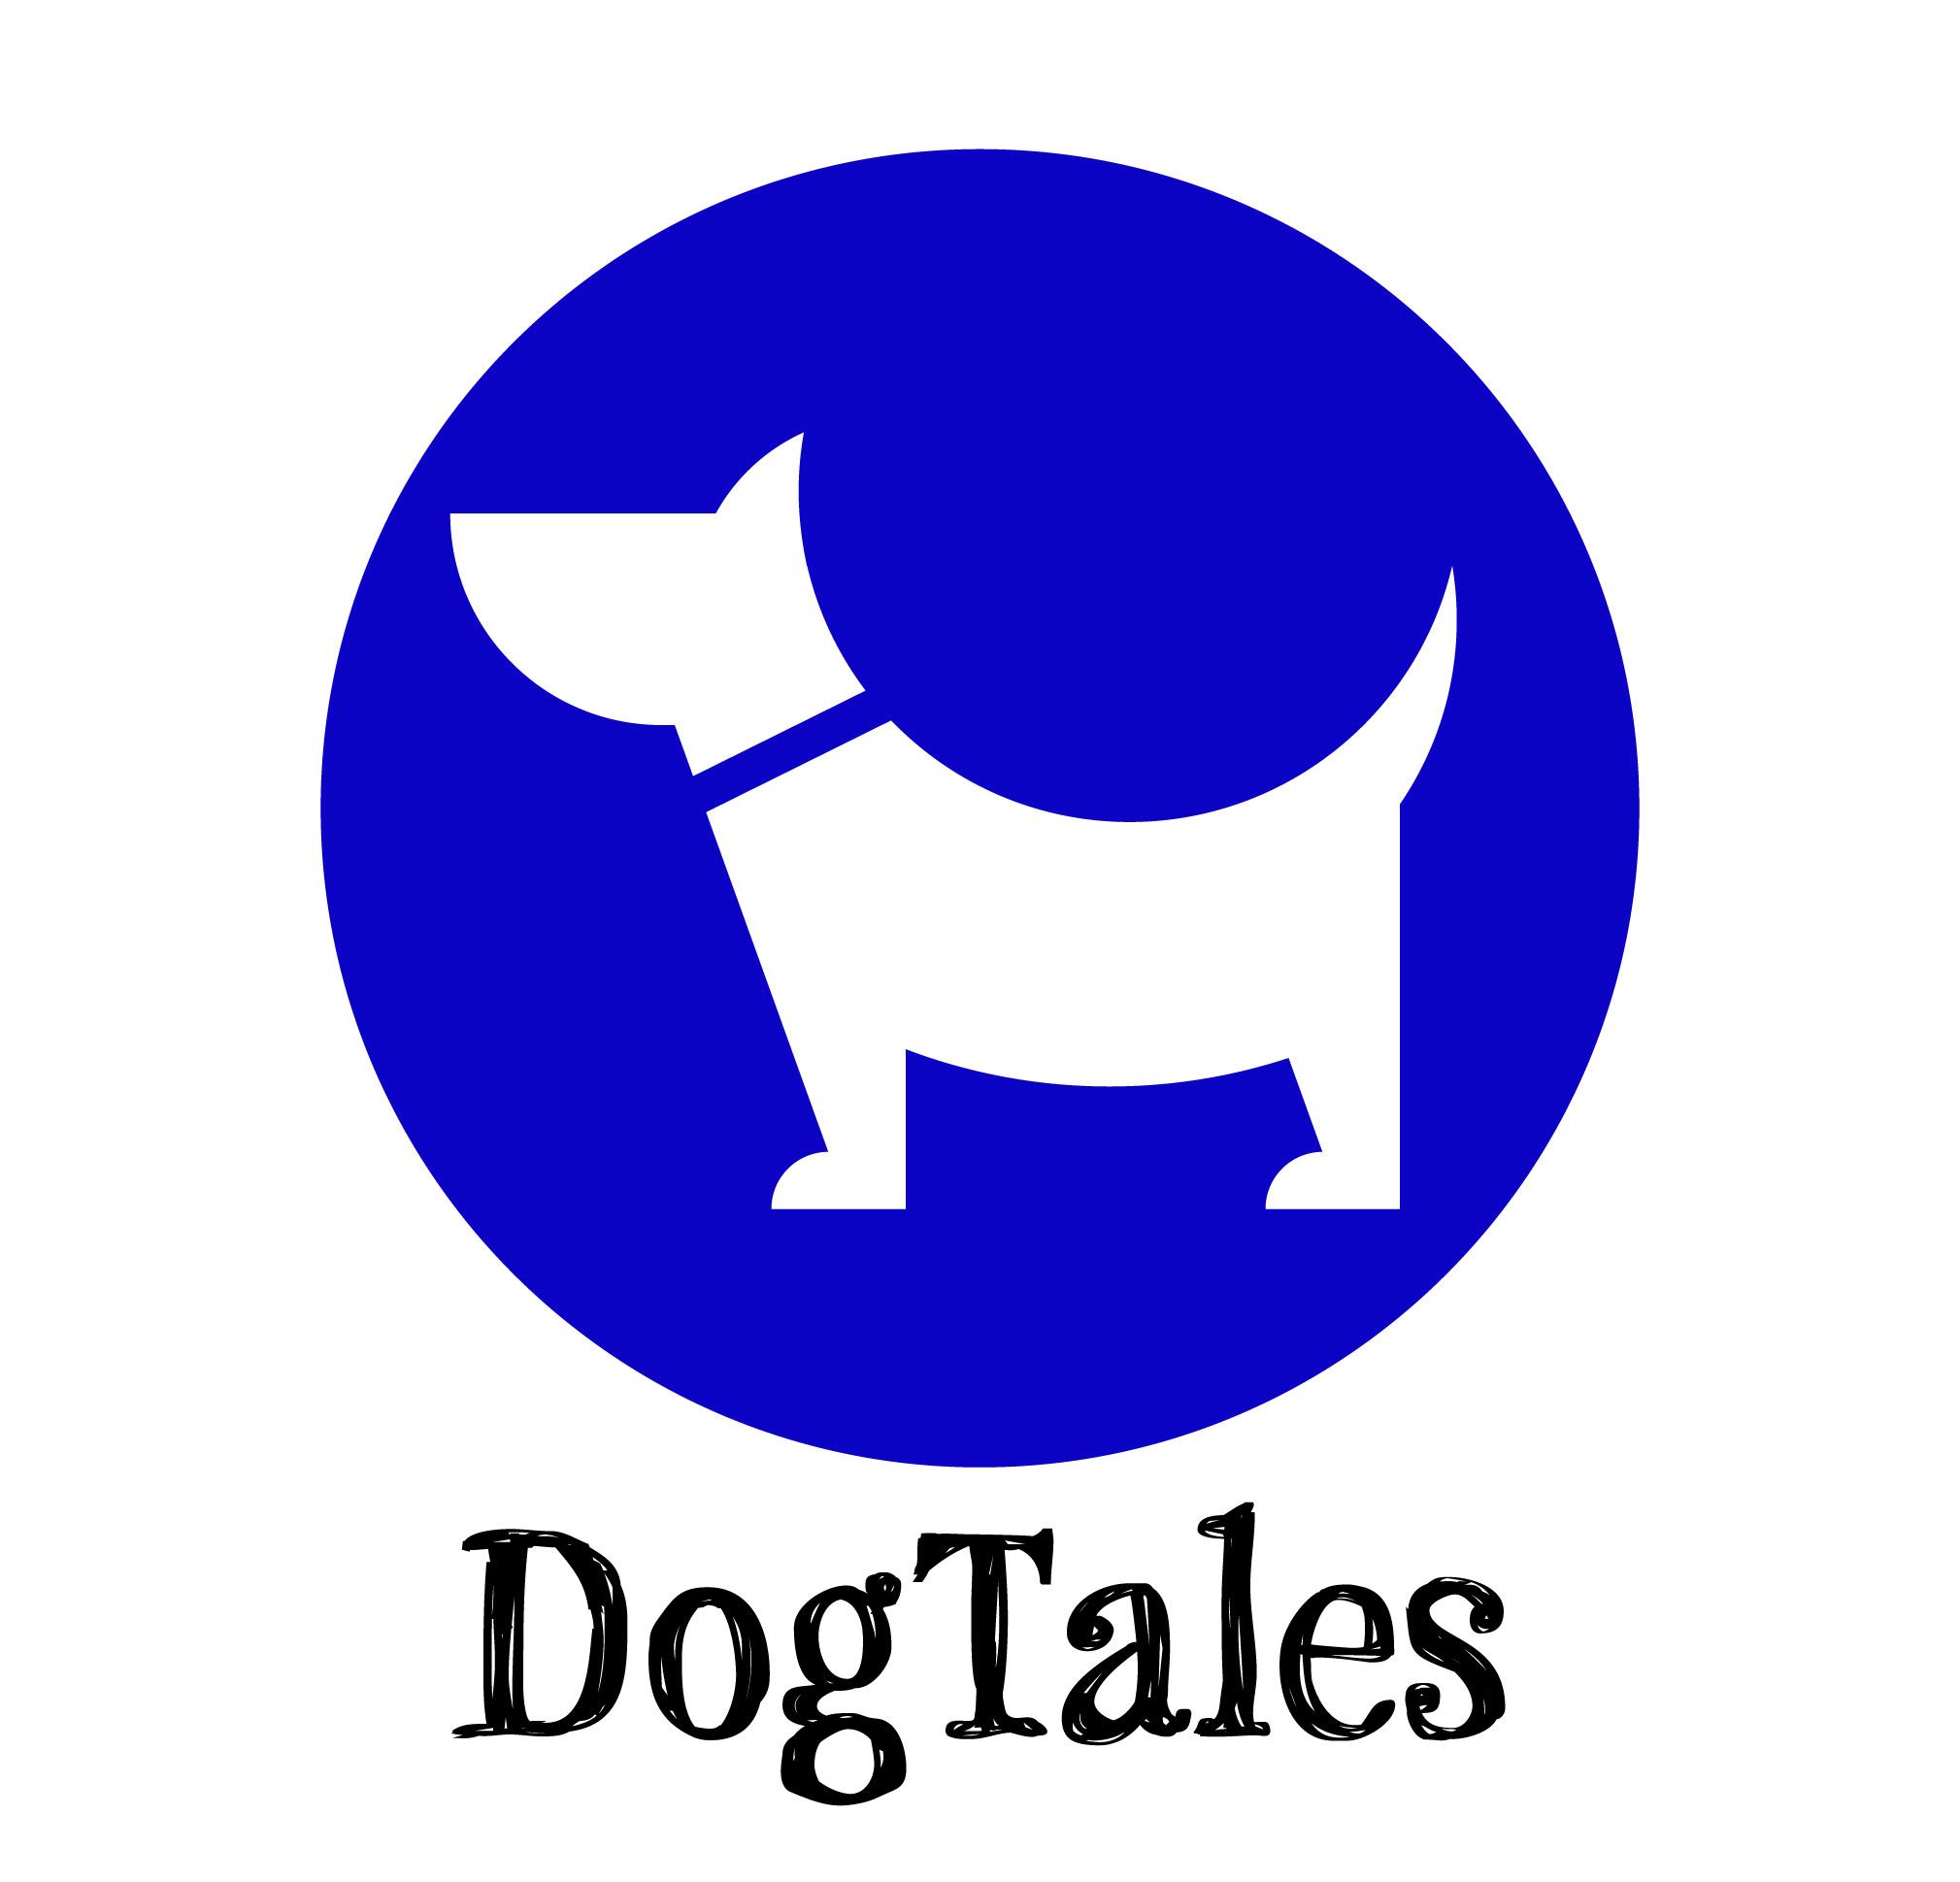 Logo Dogtales